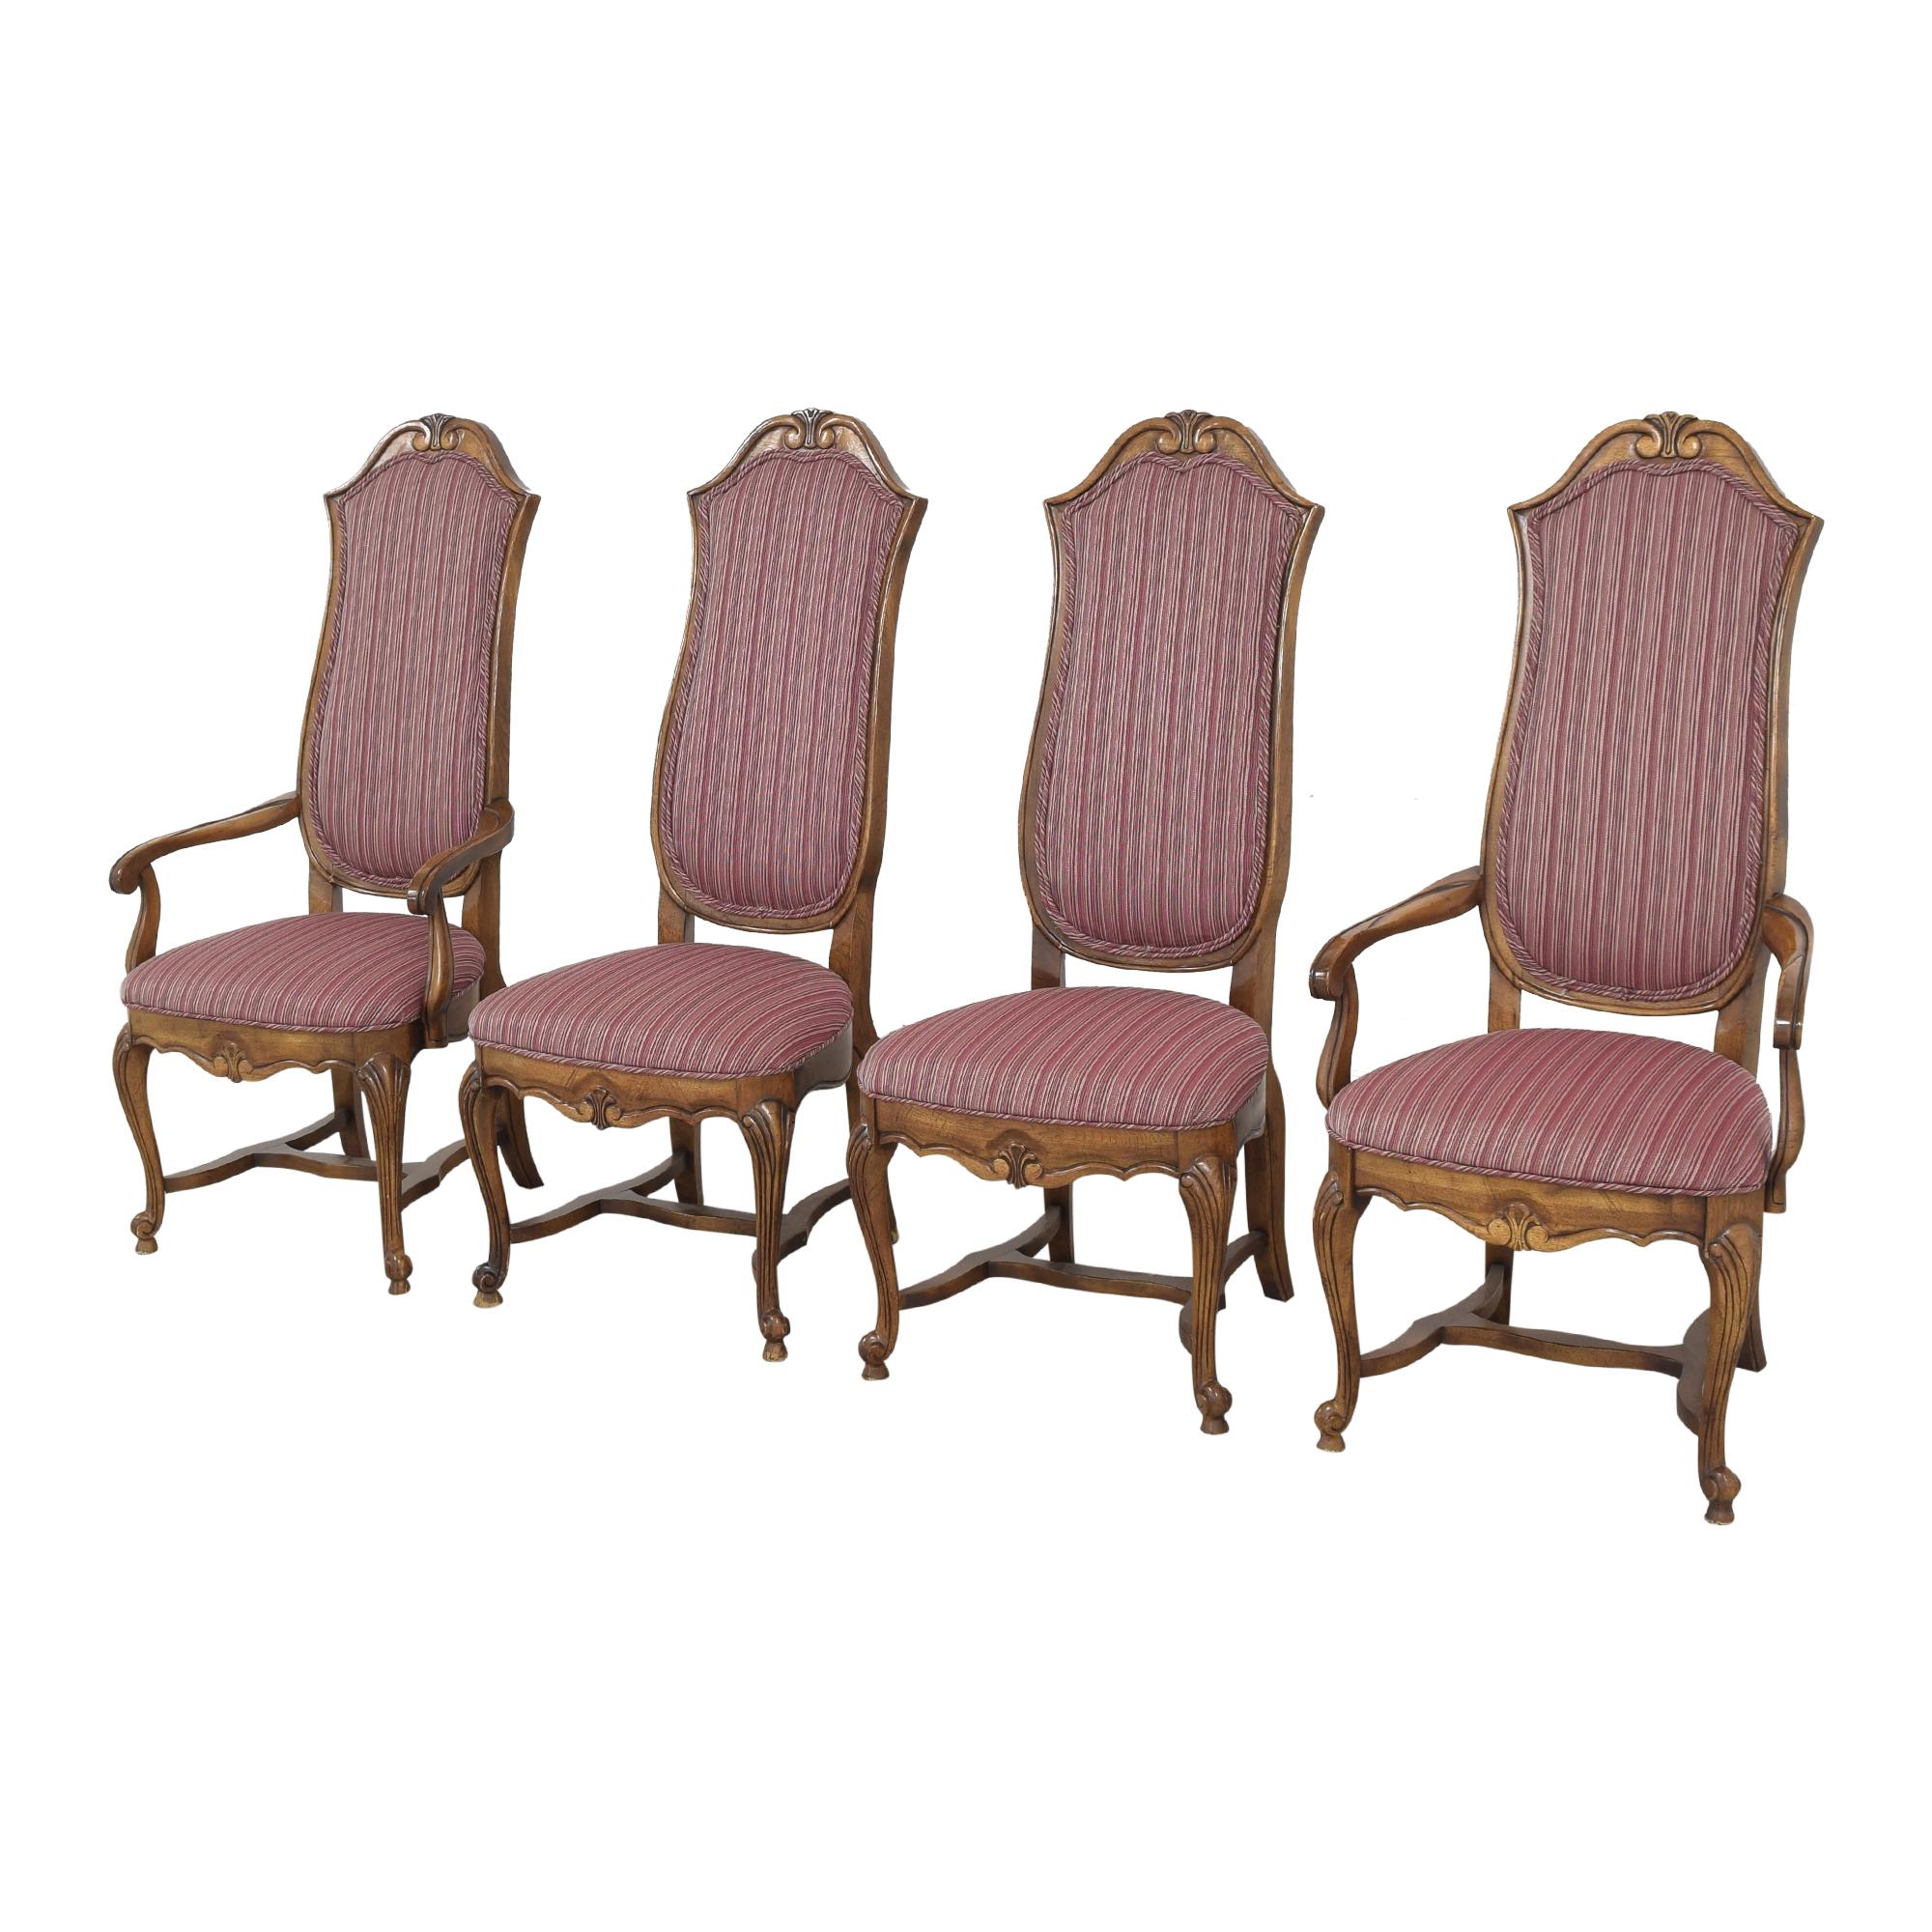 Ethan Allen Ethan Allen High Back Dining Chairs